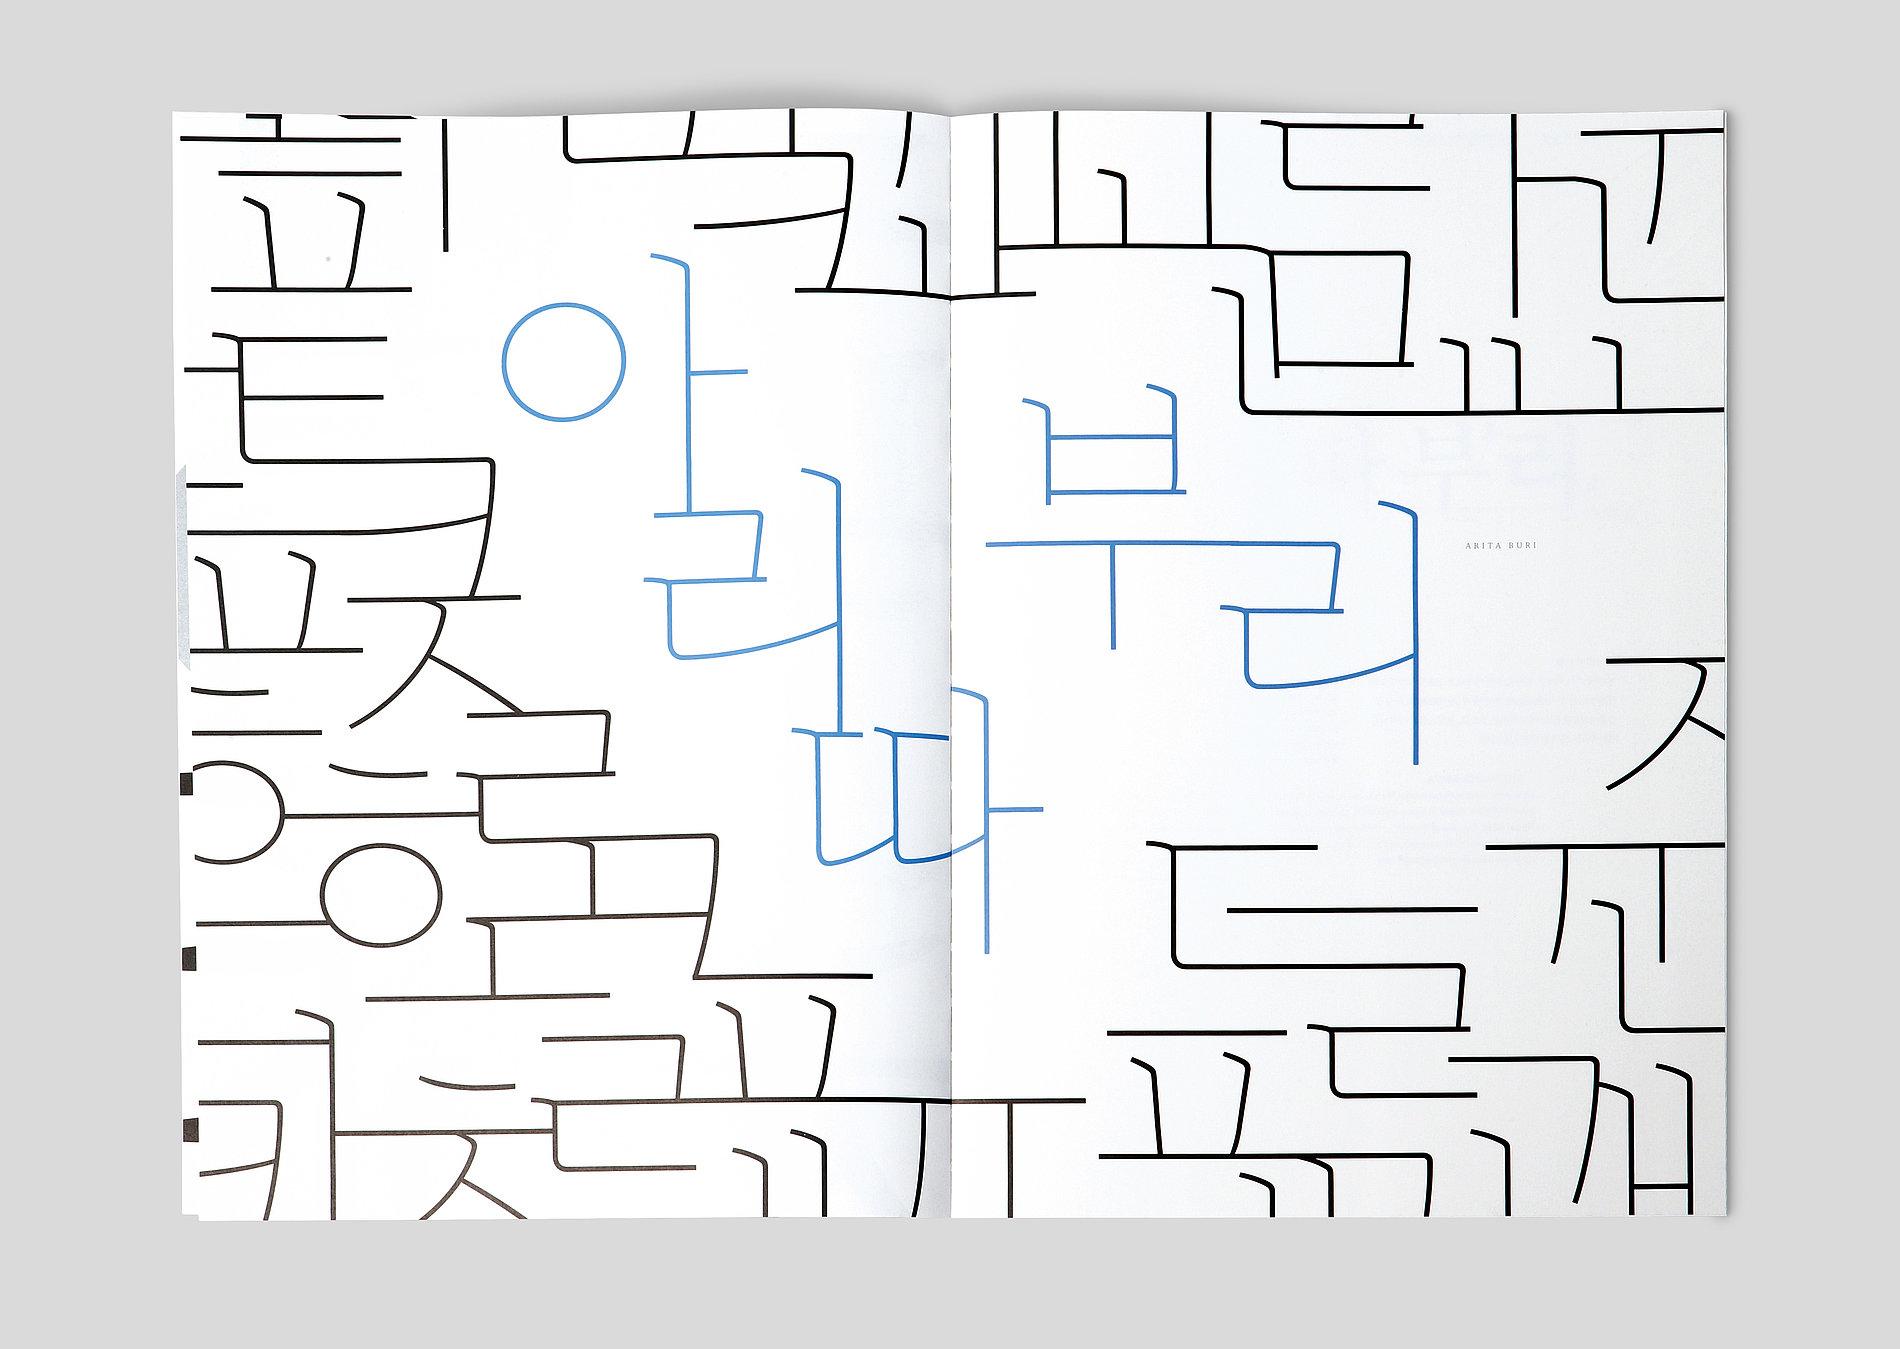 Arita Buri | Red Dot Design Award